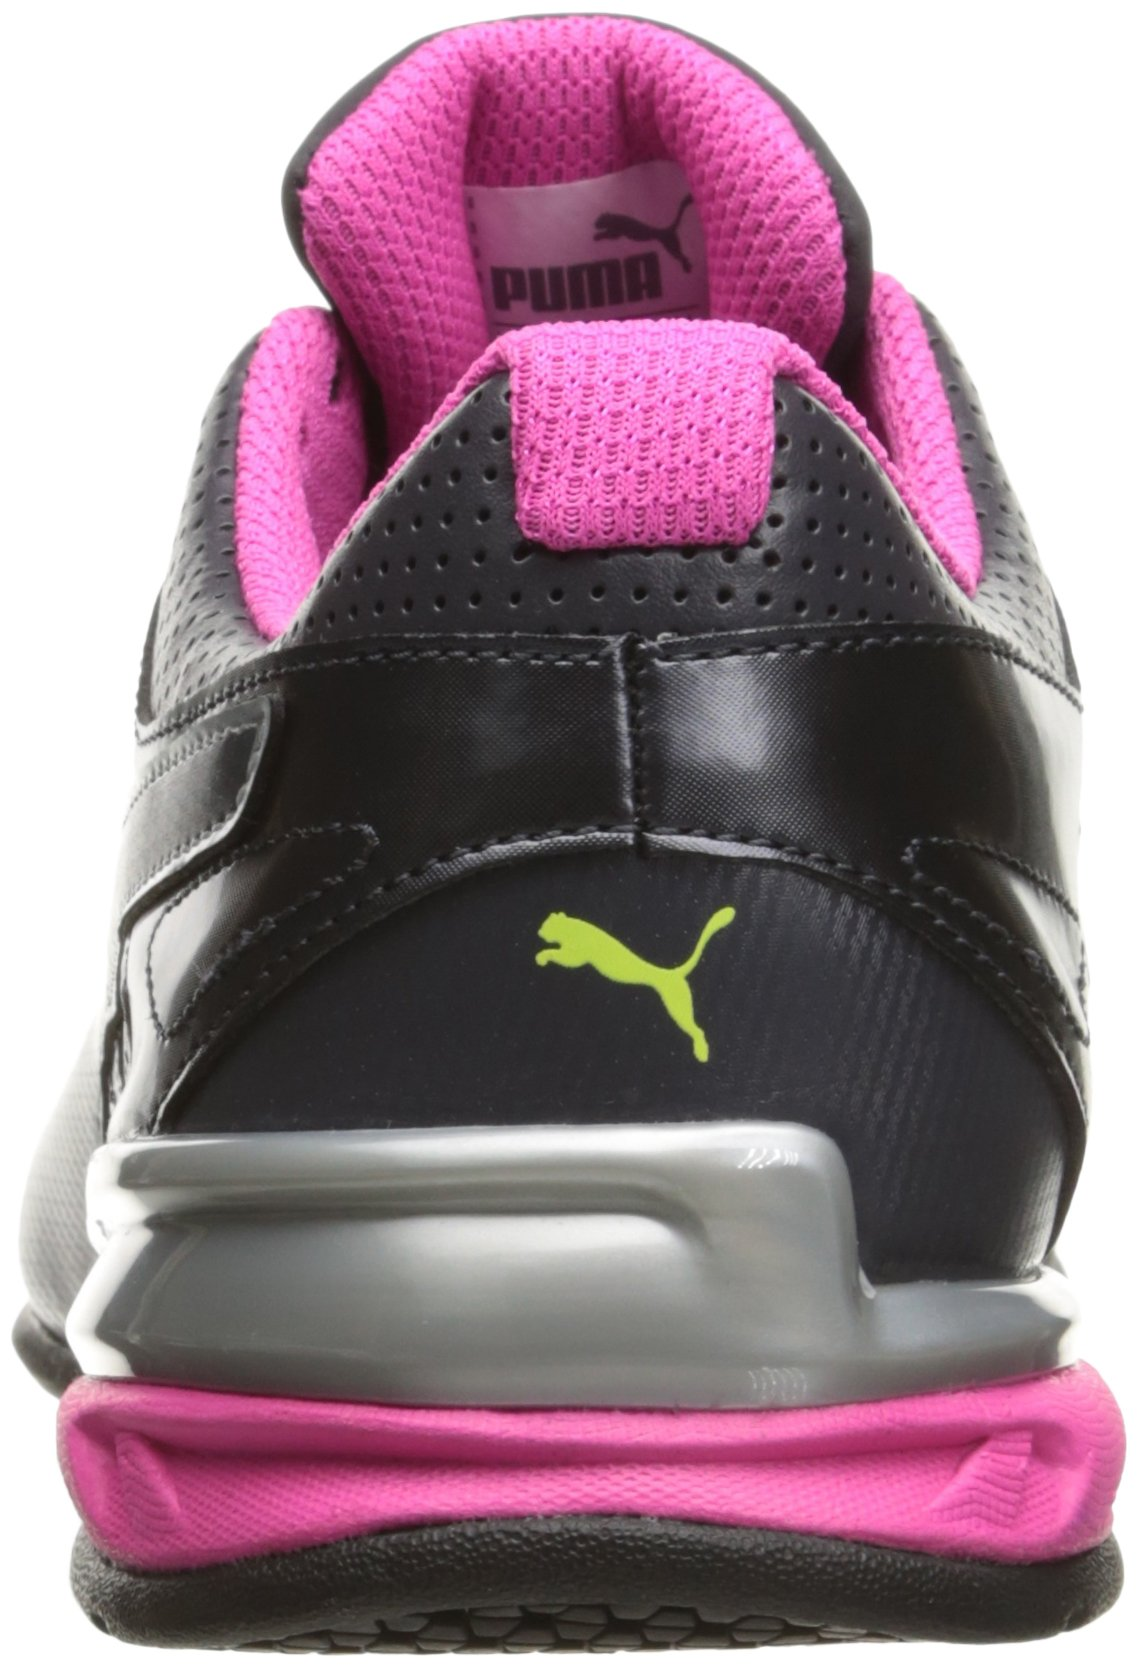 PUMA Women's Tazon 6 WN's fm Sneaker Periscope Silver-Pink glo, 6 M US by PUMA (Image #2)